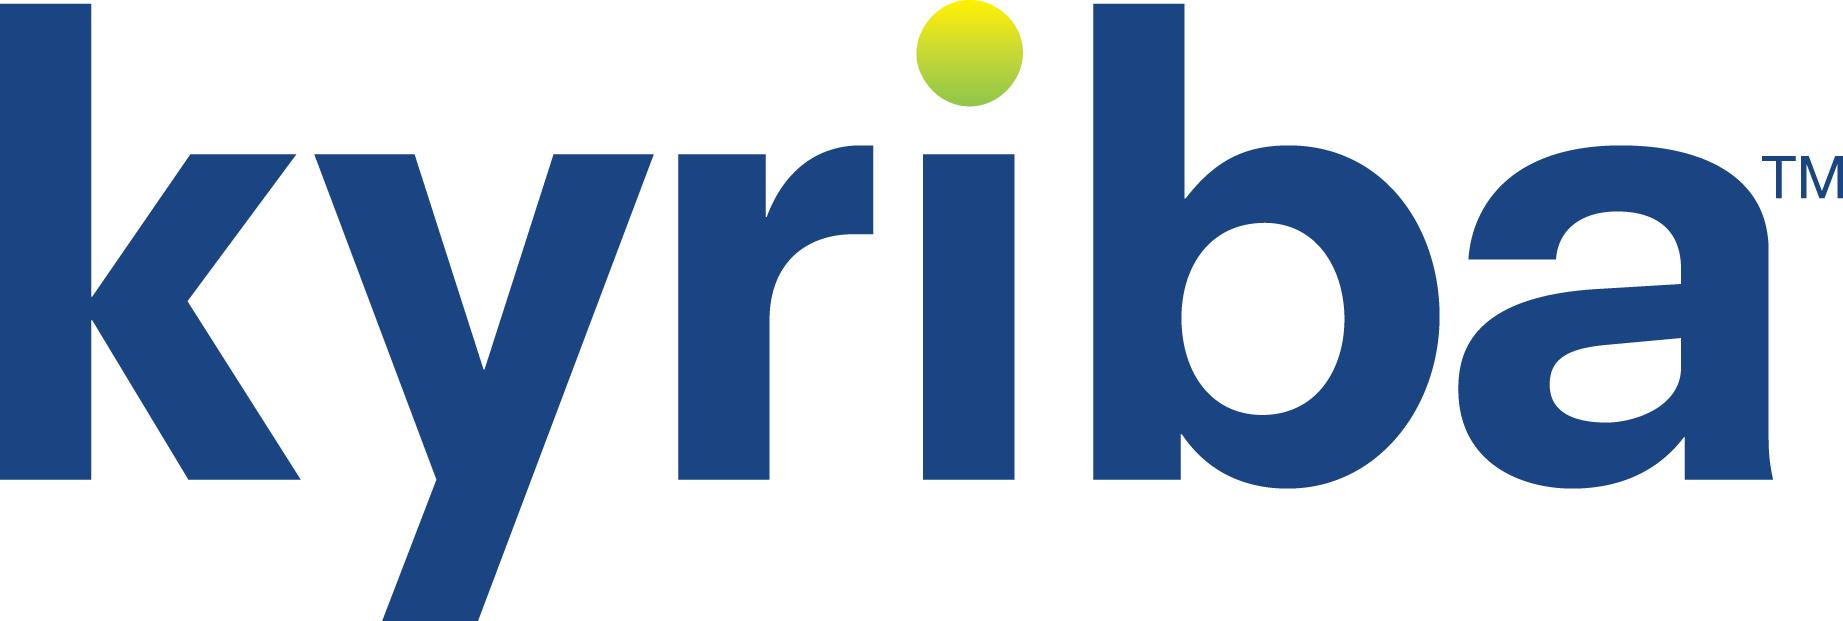 Kyriba Gains Rapid Adoption Among Top NetSuite Partners: Capgemini, Clustin, NetSoft and RSM